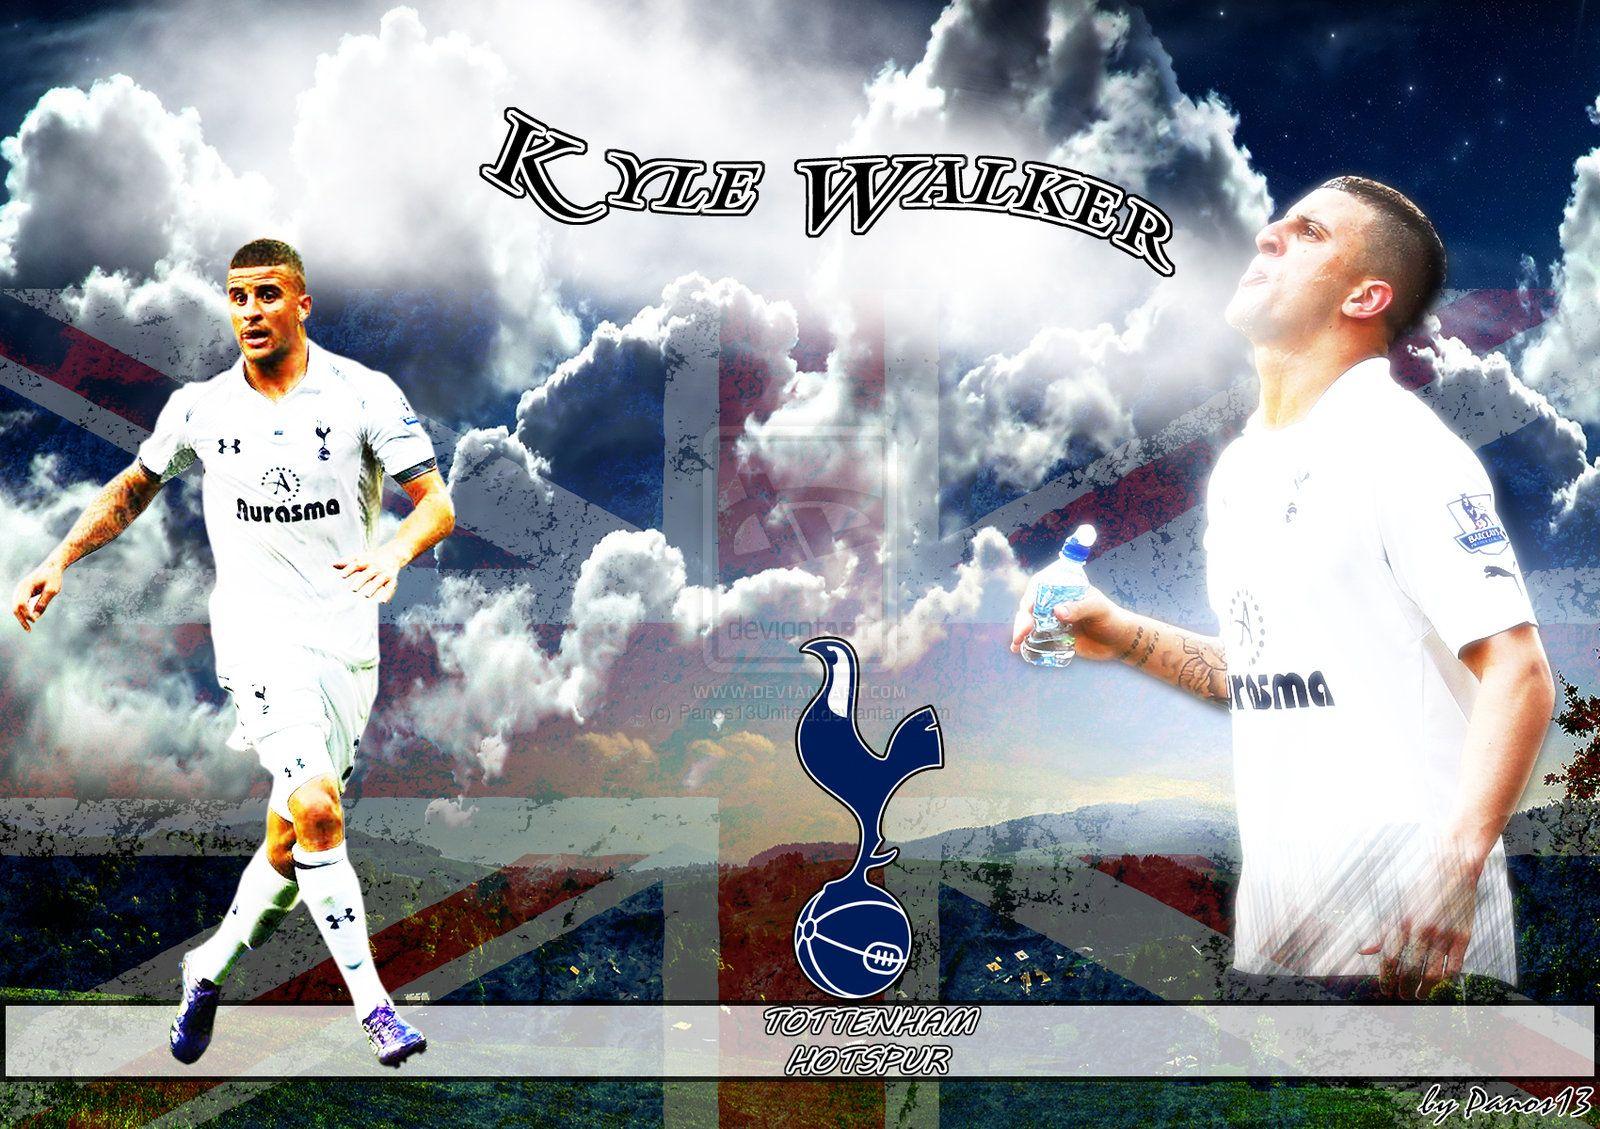 Kyle Walker Tottenham Hotspur HD Wallpaper